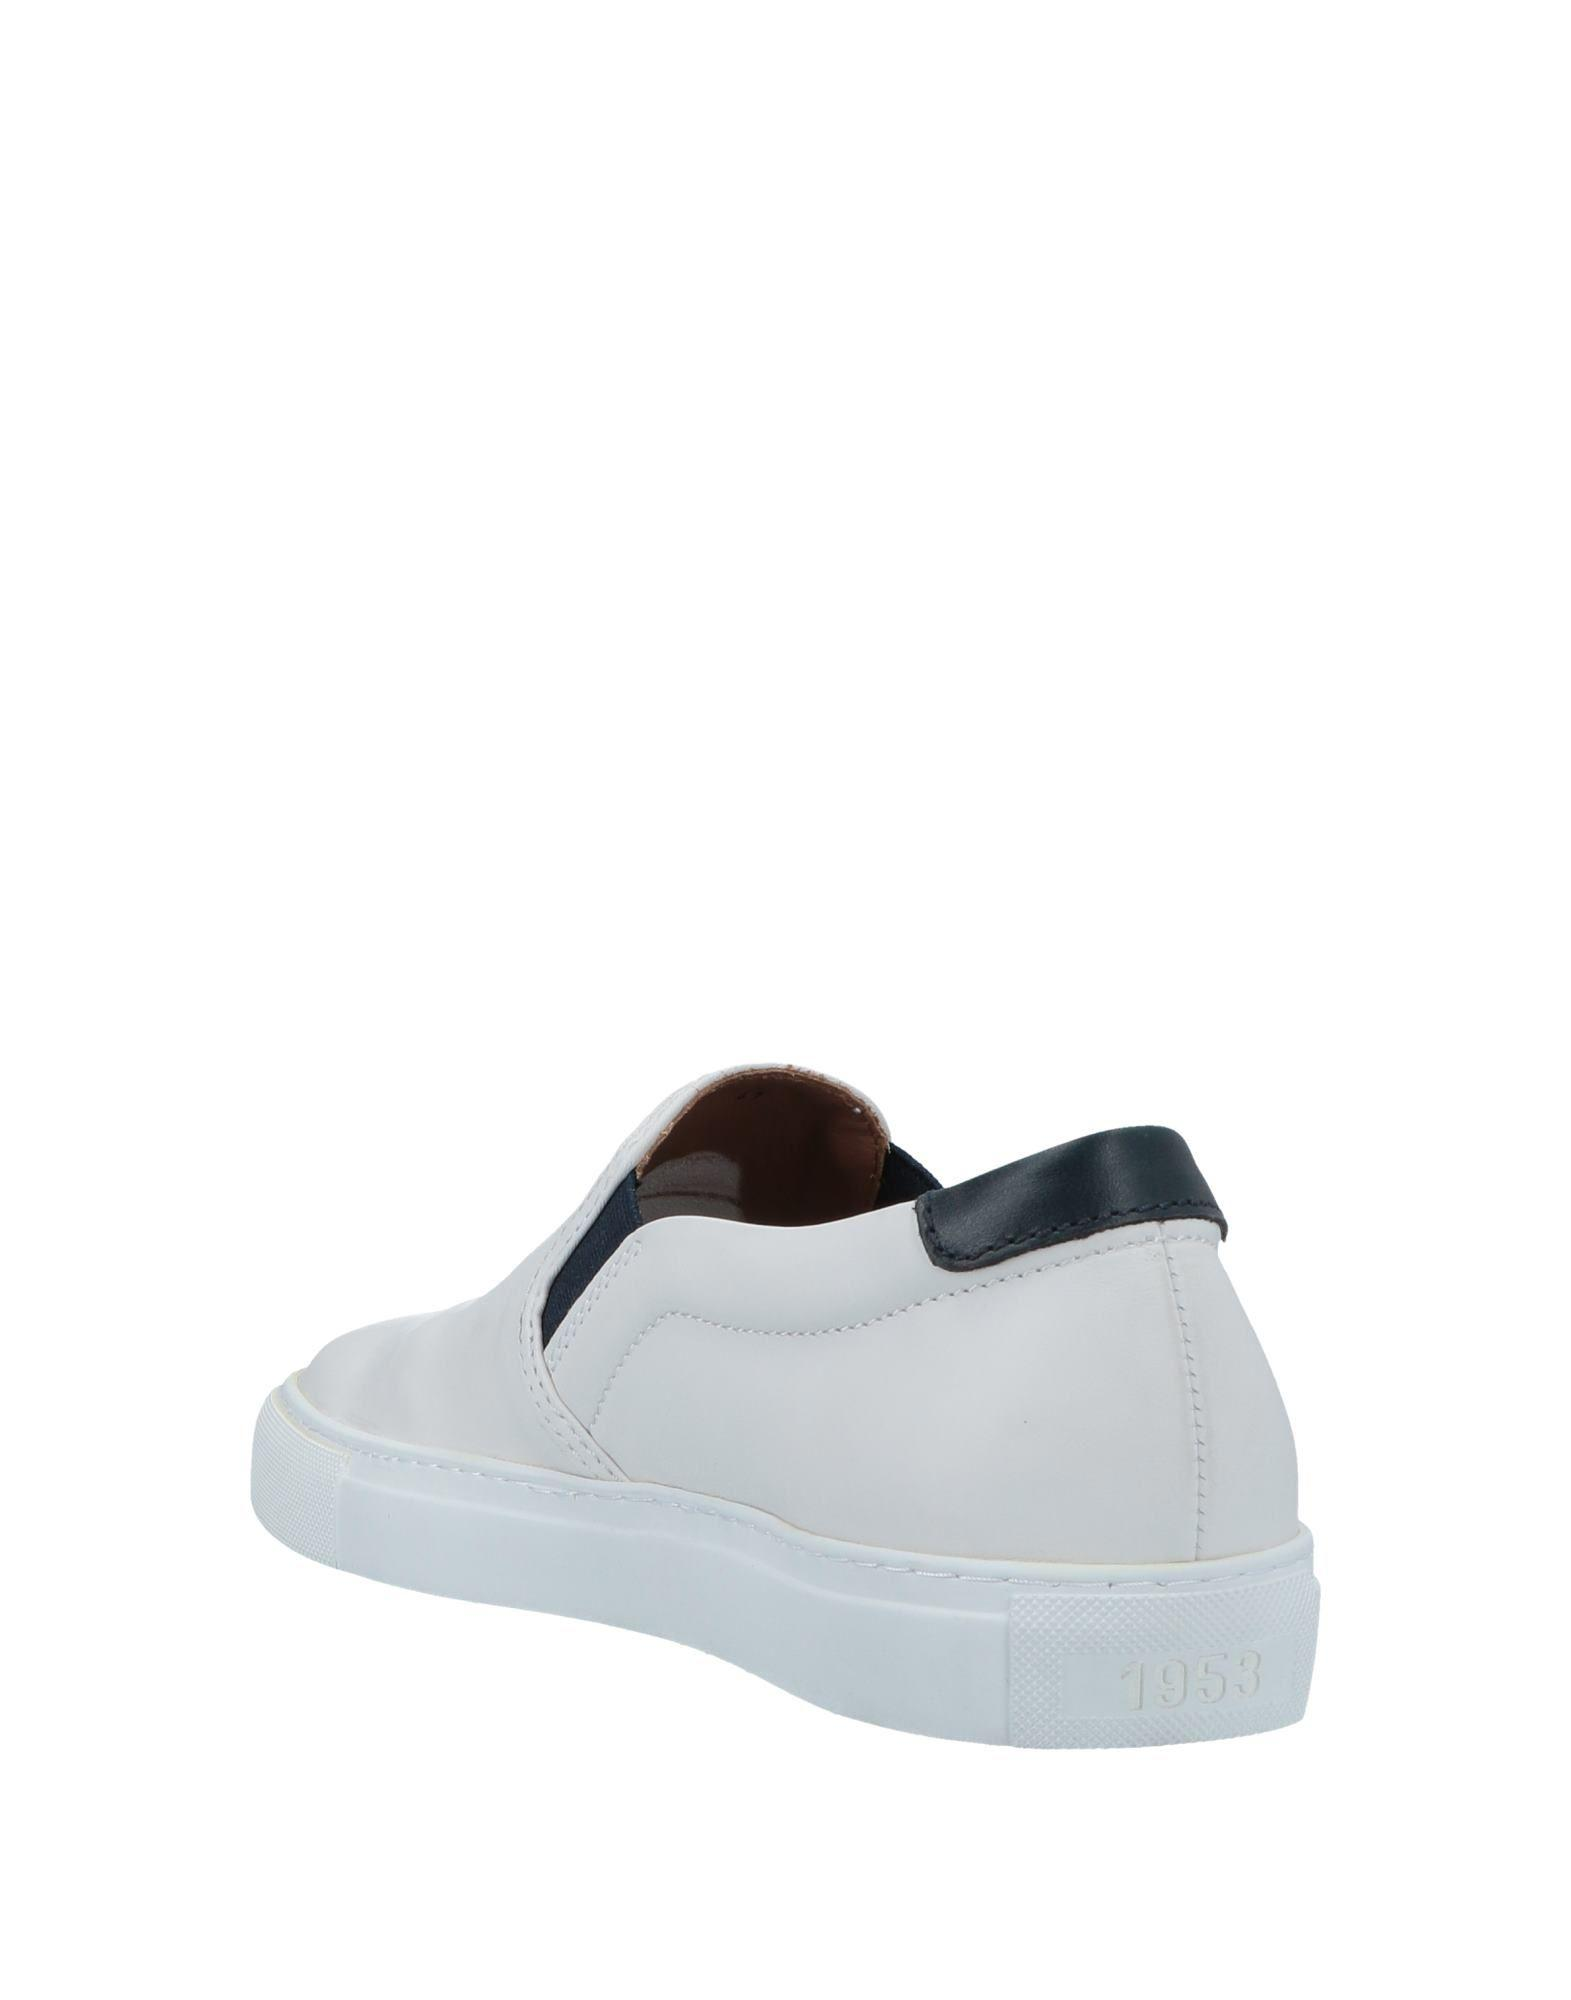 In Minoronzoni White Low Men Lyst Topsamp; Sneakers For l1FJc3TK